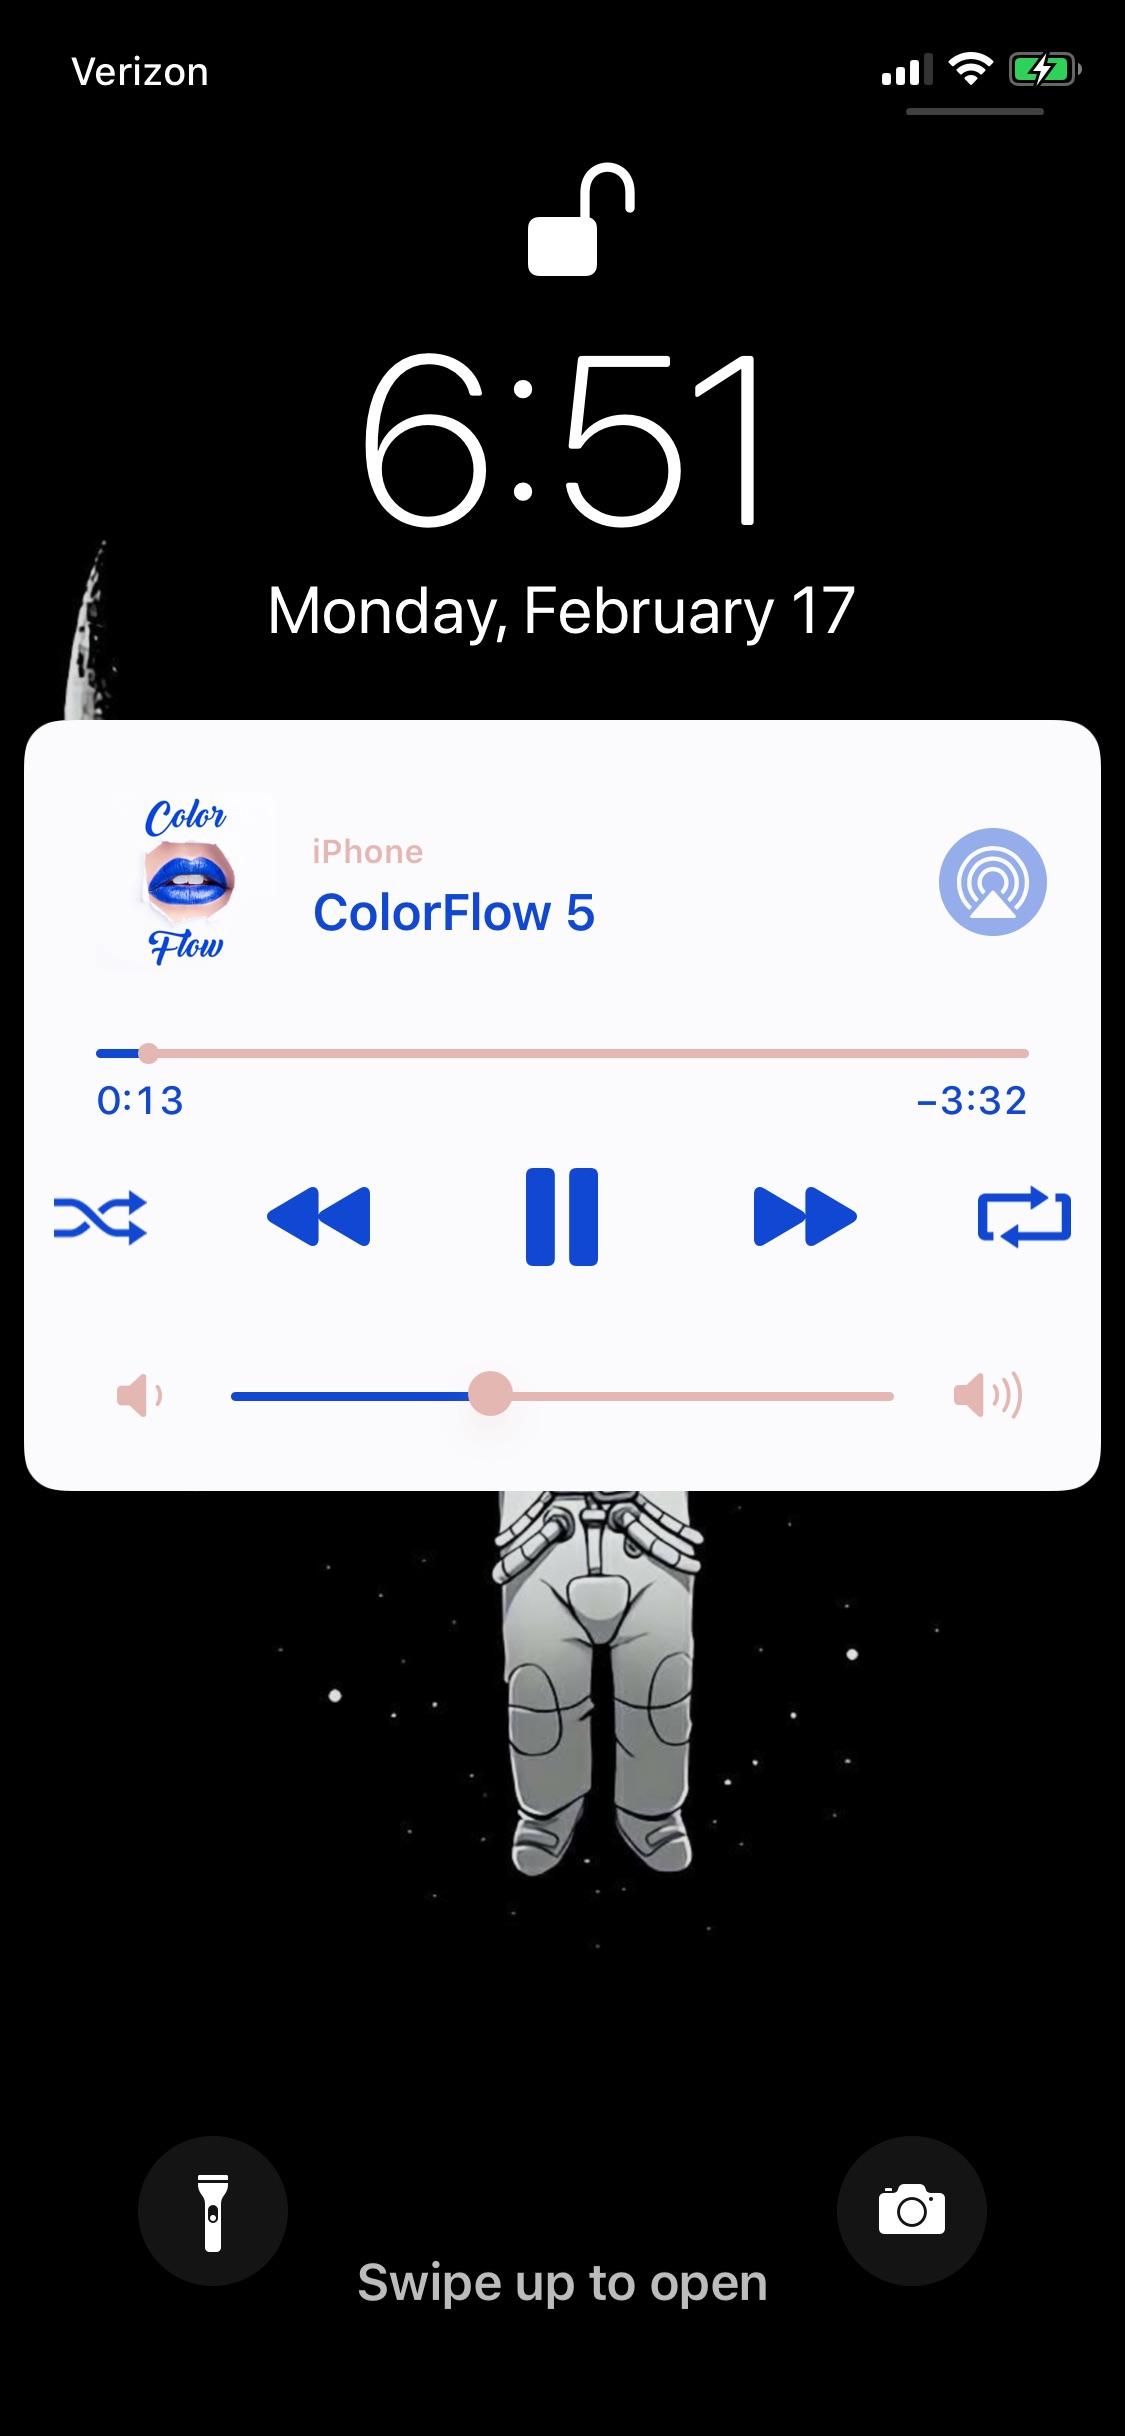 Download ColorFlow 5 (iOS 13) 1.0.6